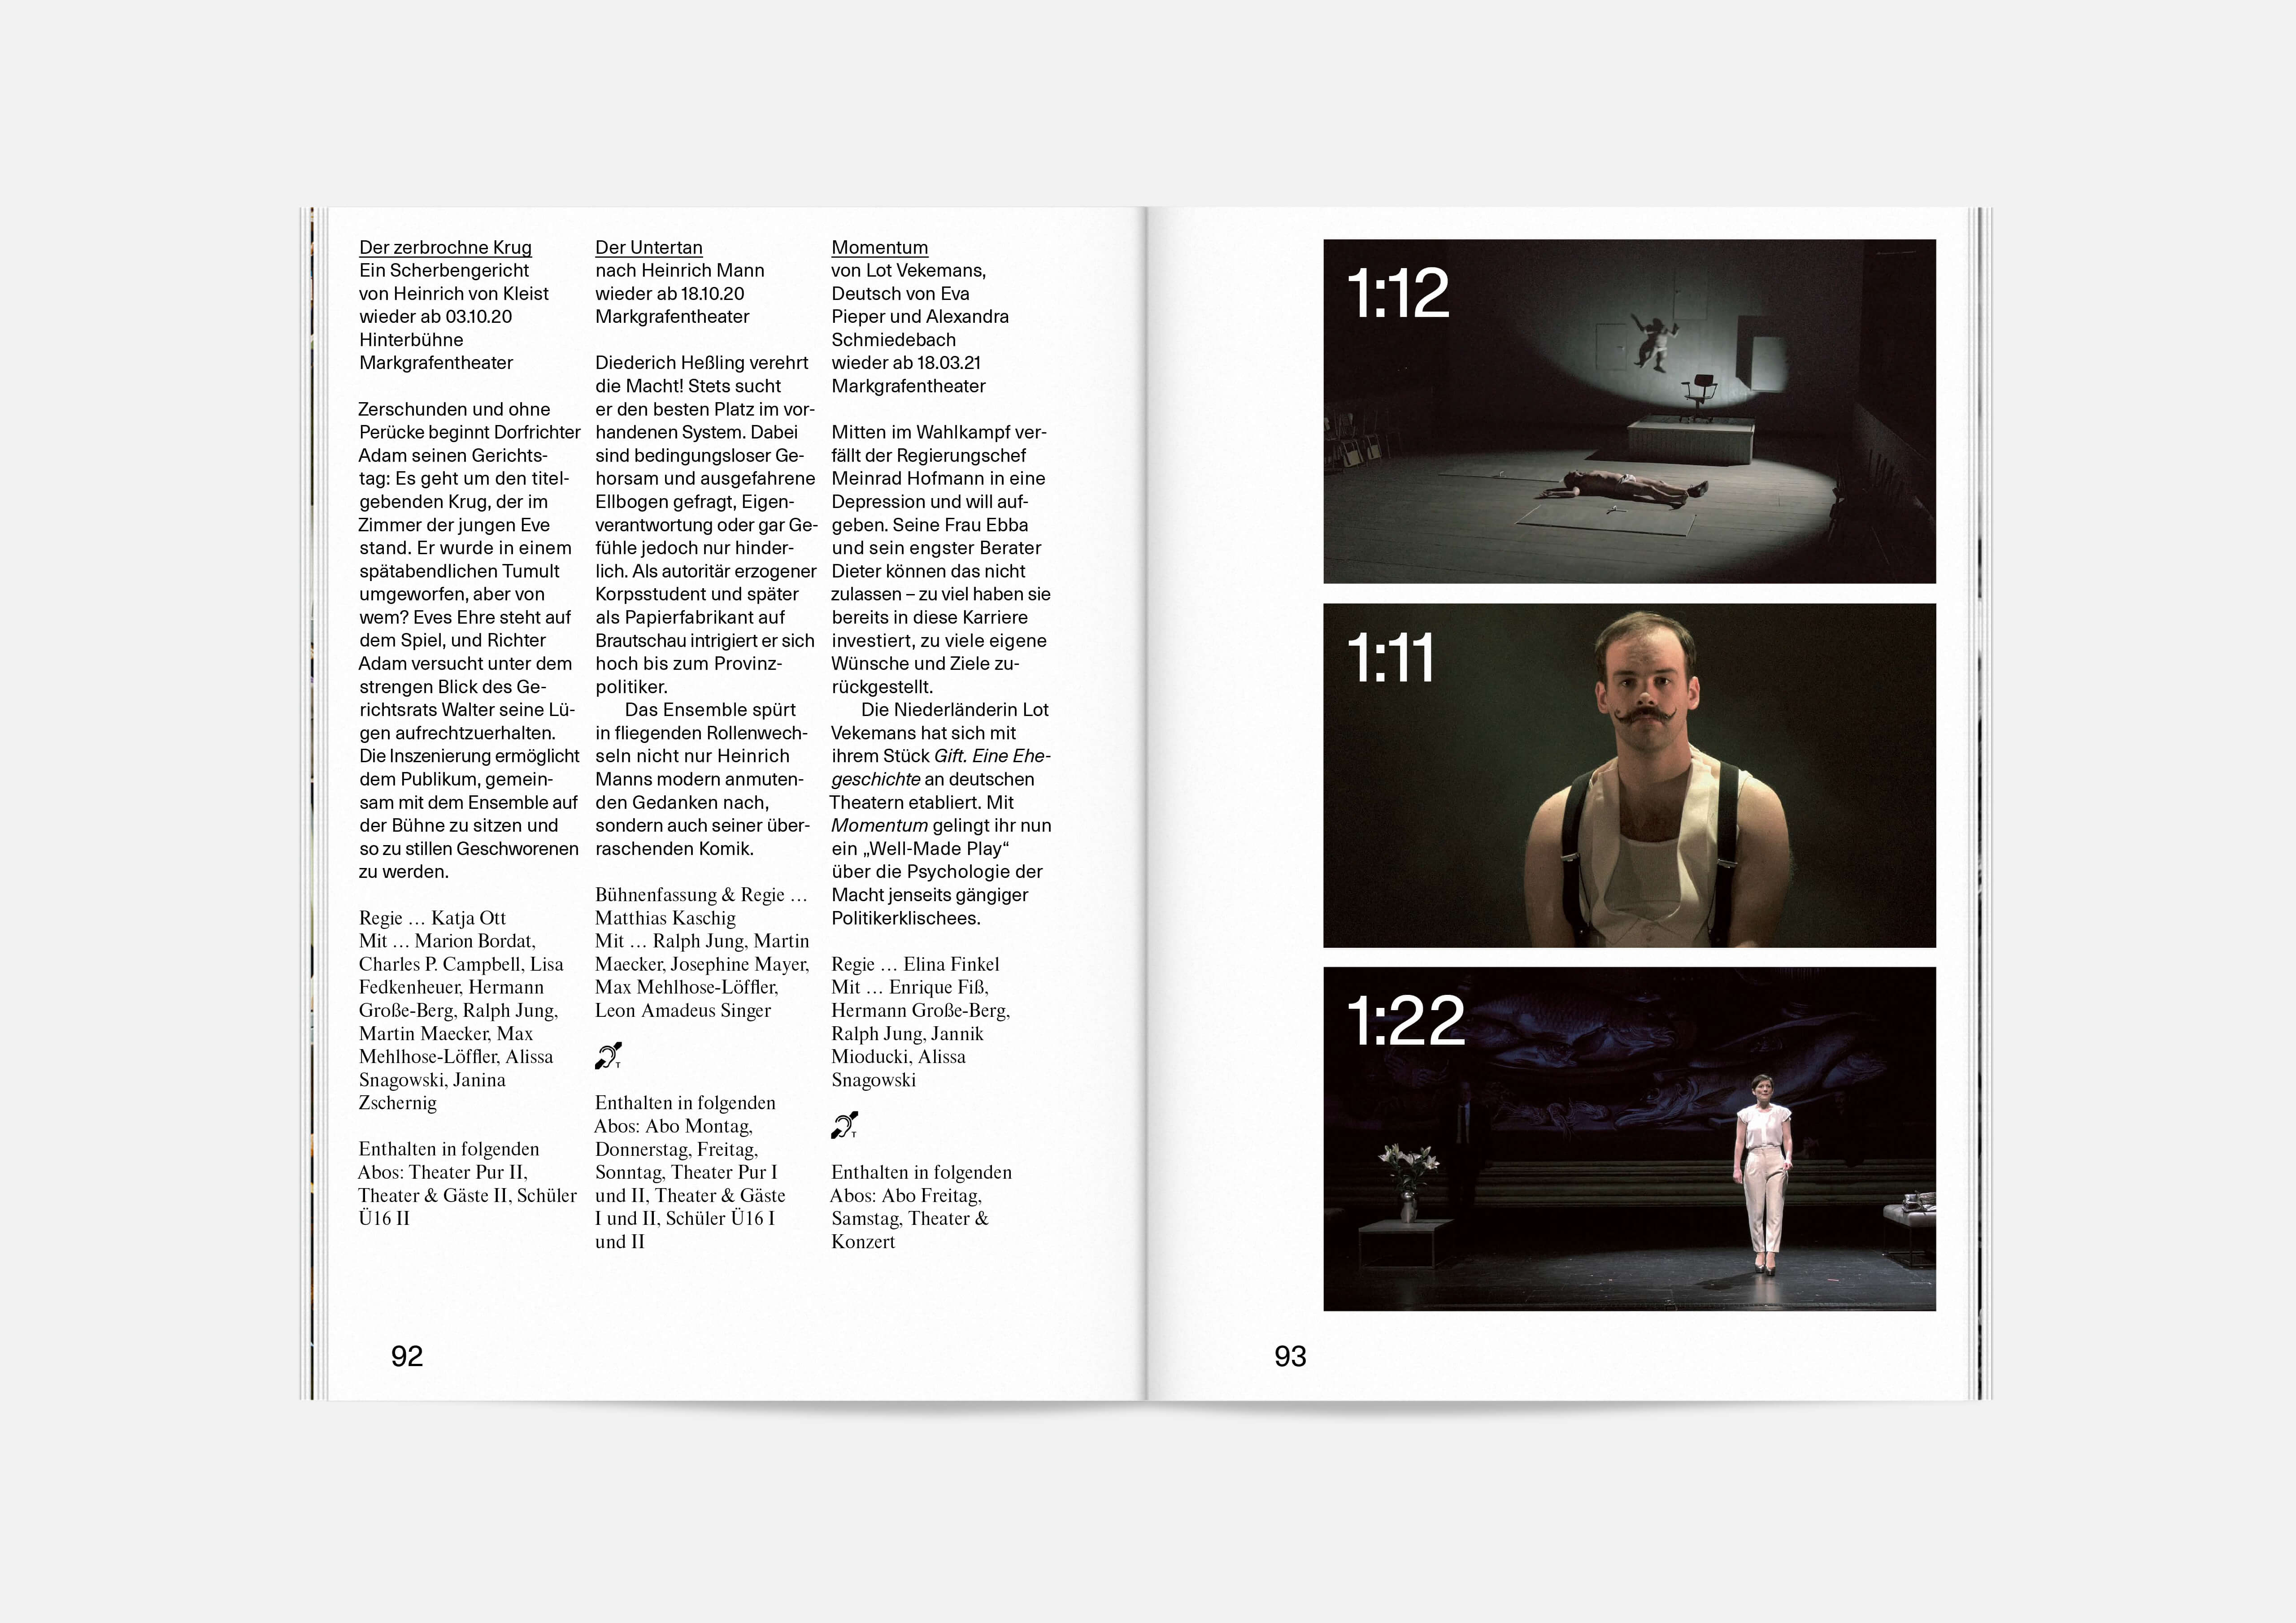 https://neuegestaltung.de/media/pages/clients/theater-erlangen-season-program-20-21/b086bf0a42-1606409631/27_te-spielzeitheft2021.jpg